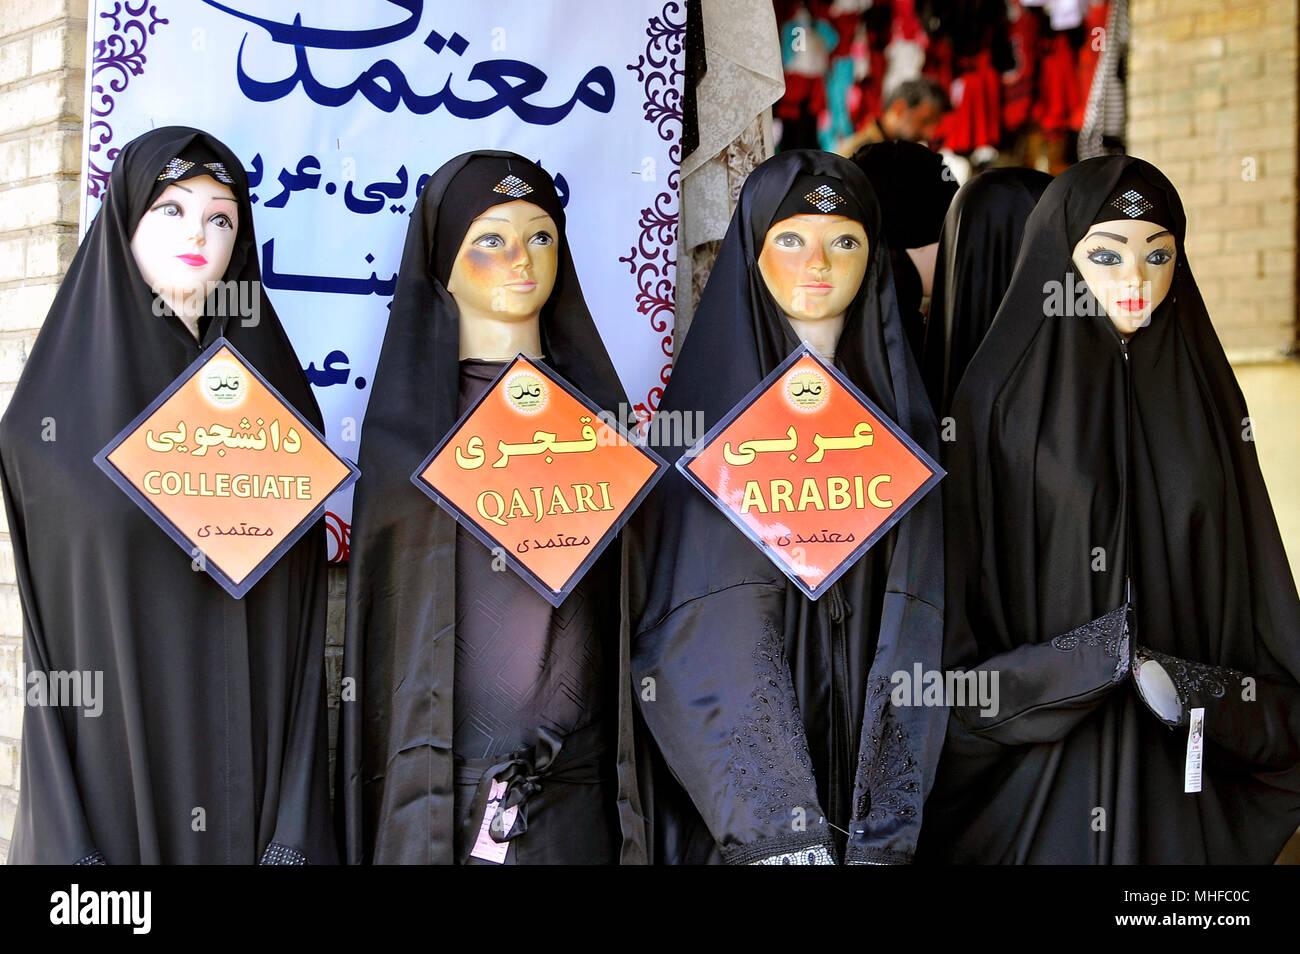 Shop selling Islamic outfit in Isfahan bazaar - Iran © Antonio Ciufo - Stock Image